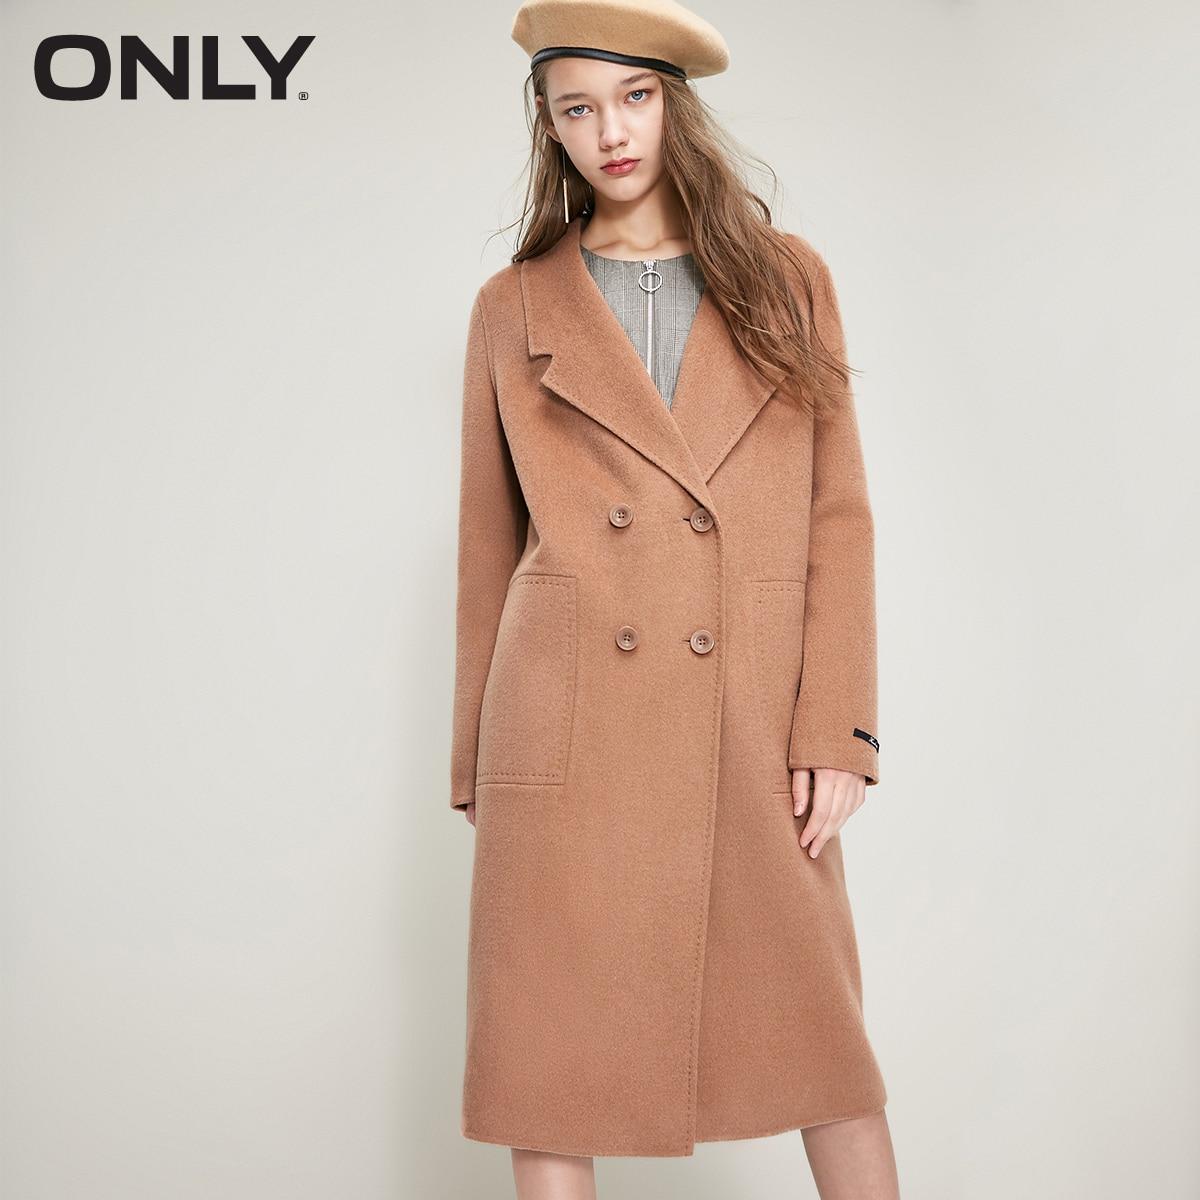 ONLY 2018 Women's Winter Long Double-faced Woolen Coat  | 11834S504